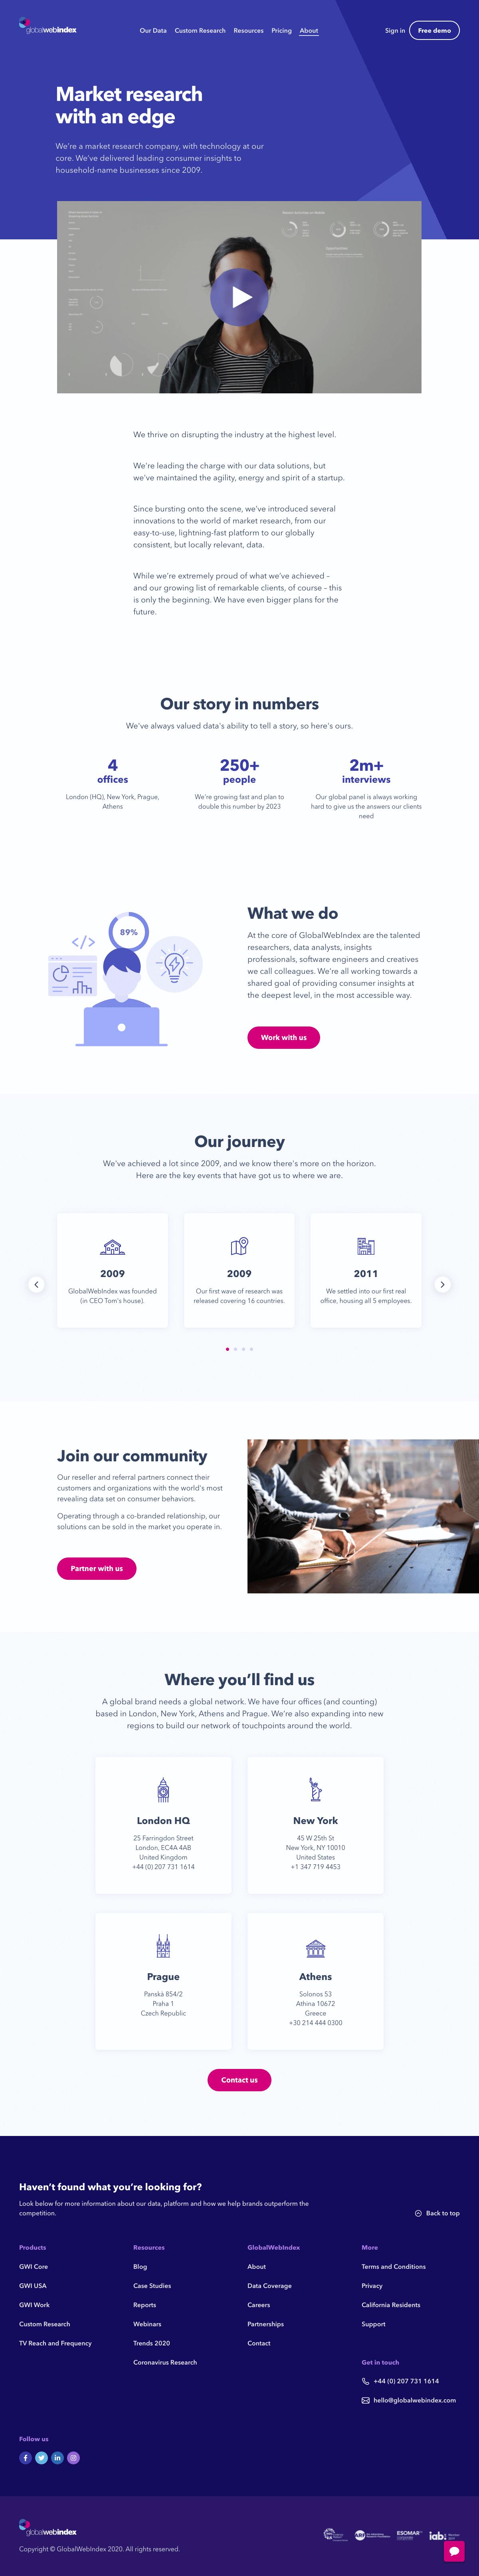 GlobalWebIndex – About Us page